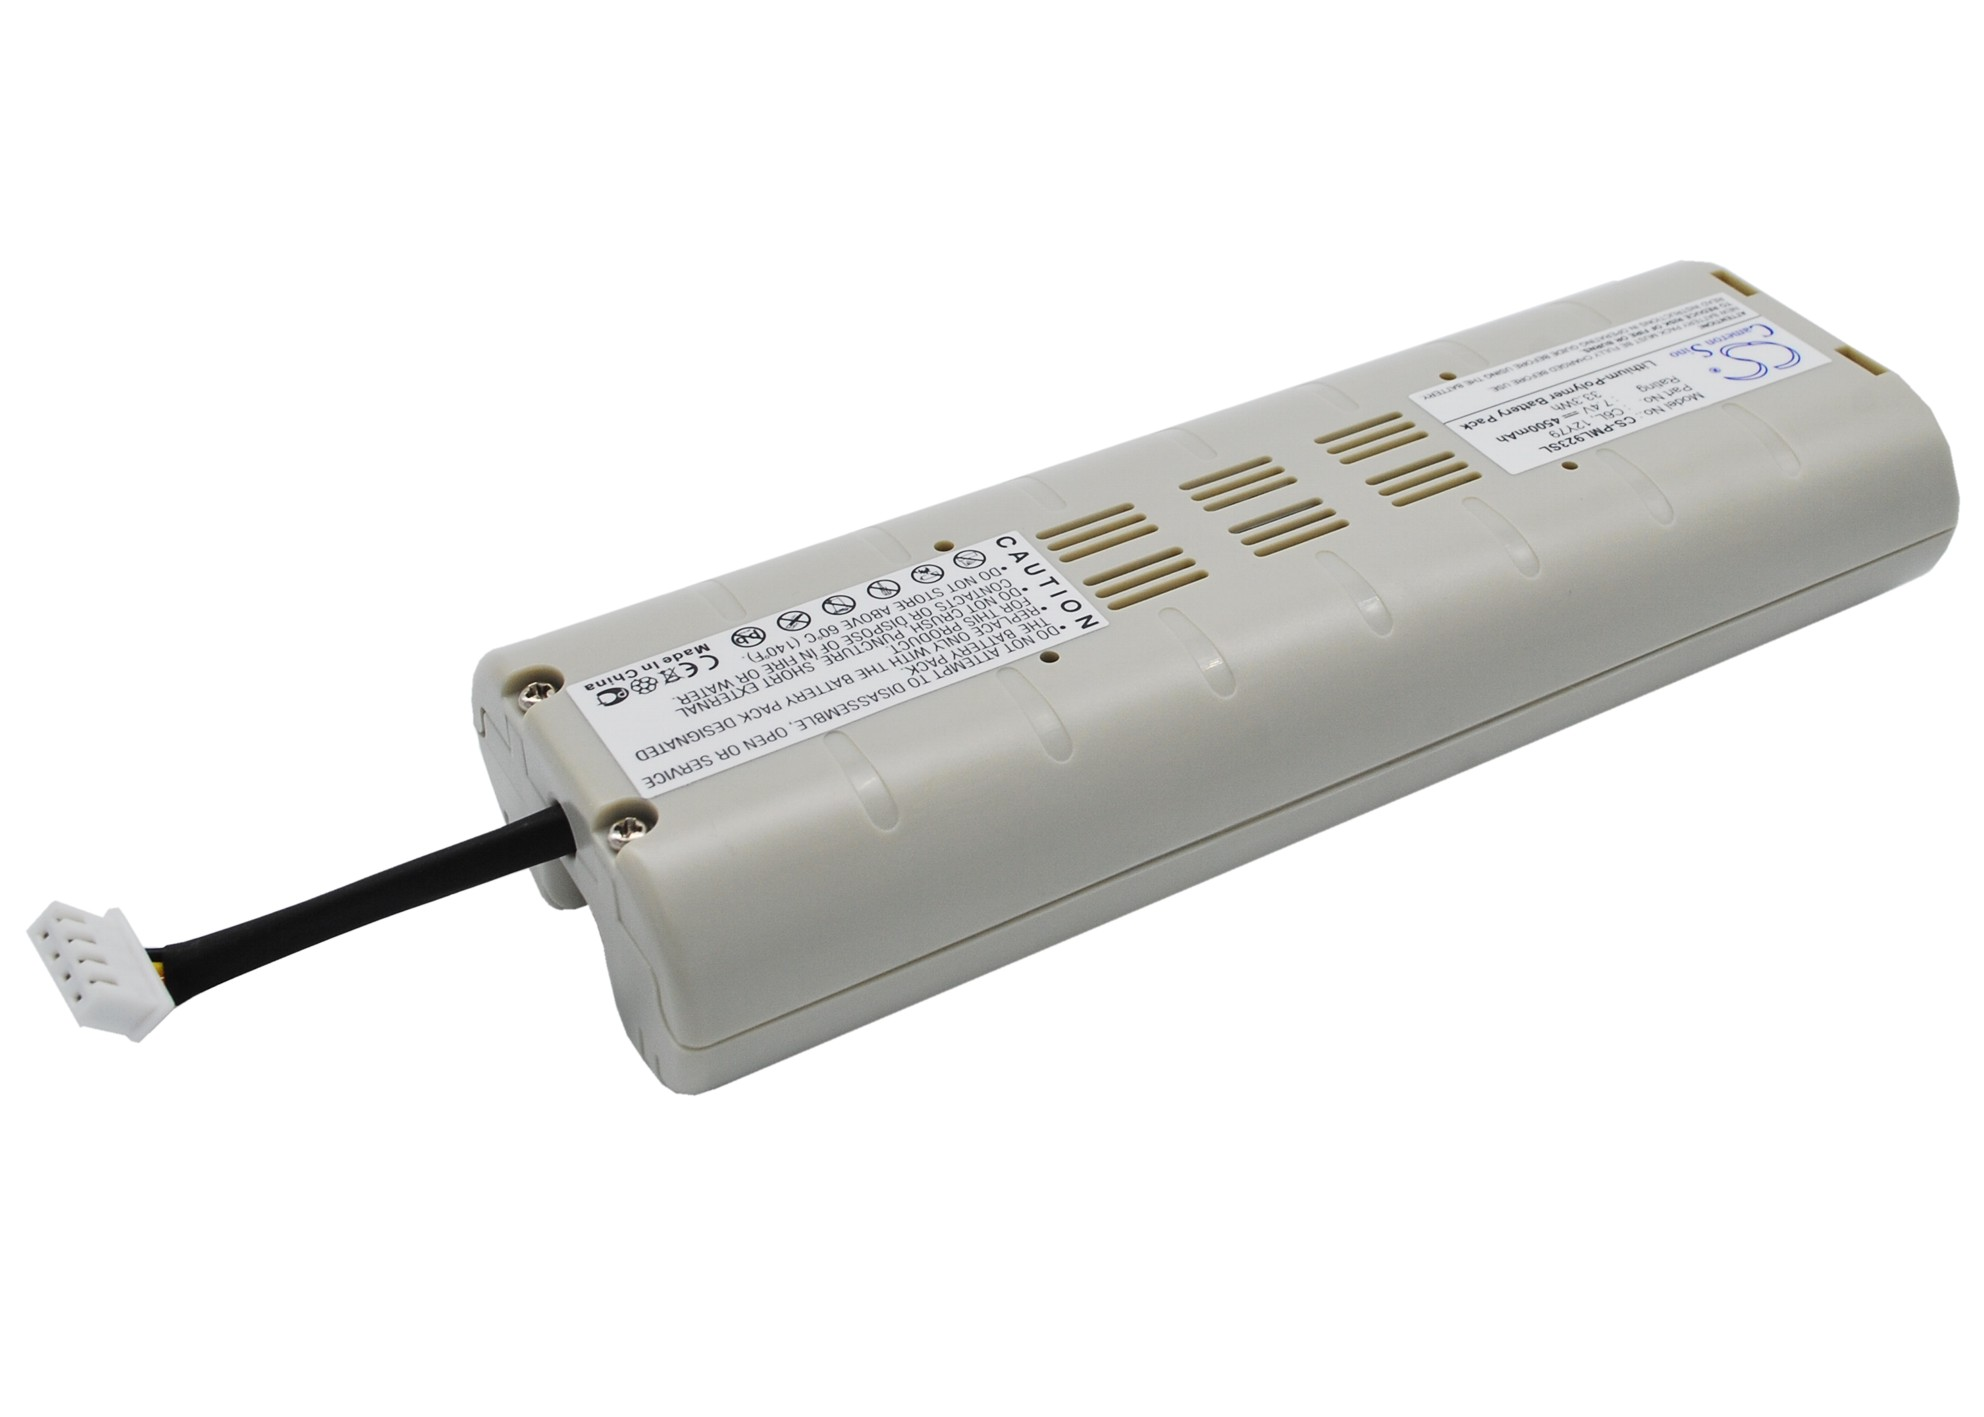 Cameron Sino baterie do digitálních rádií pro PURE Evoke 3 7.4V Li-Polymer 4500mAh šedá bílá - neoriginální